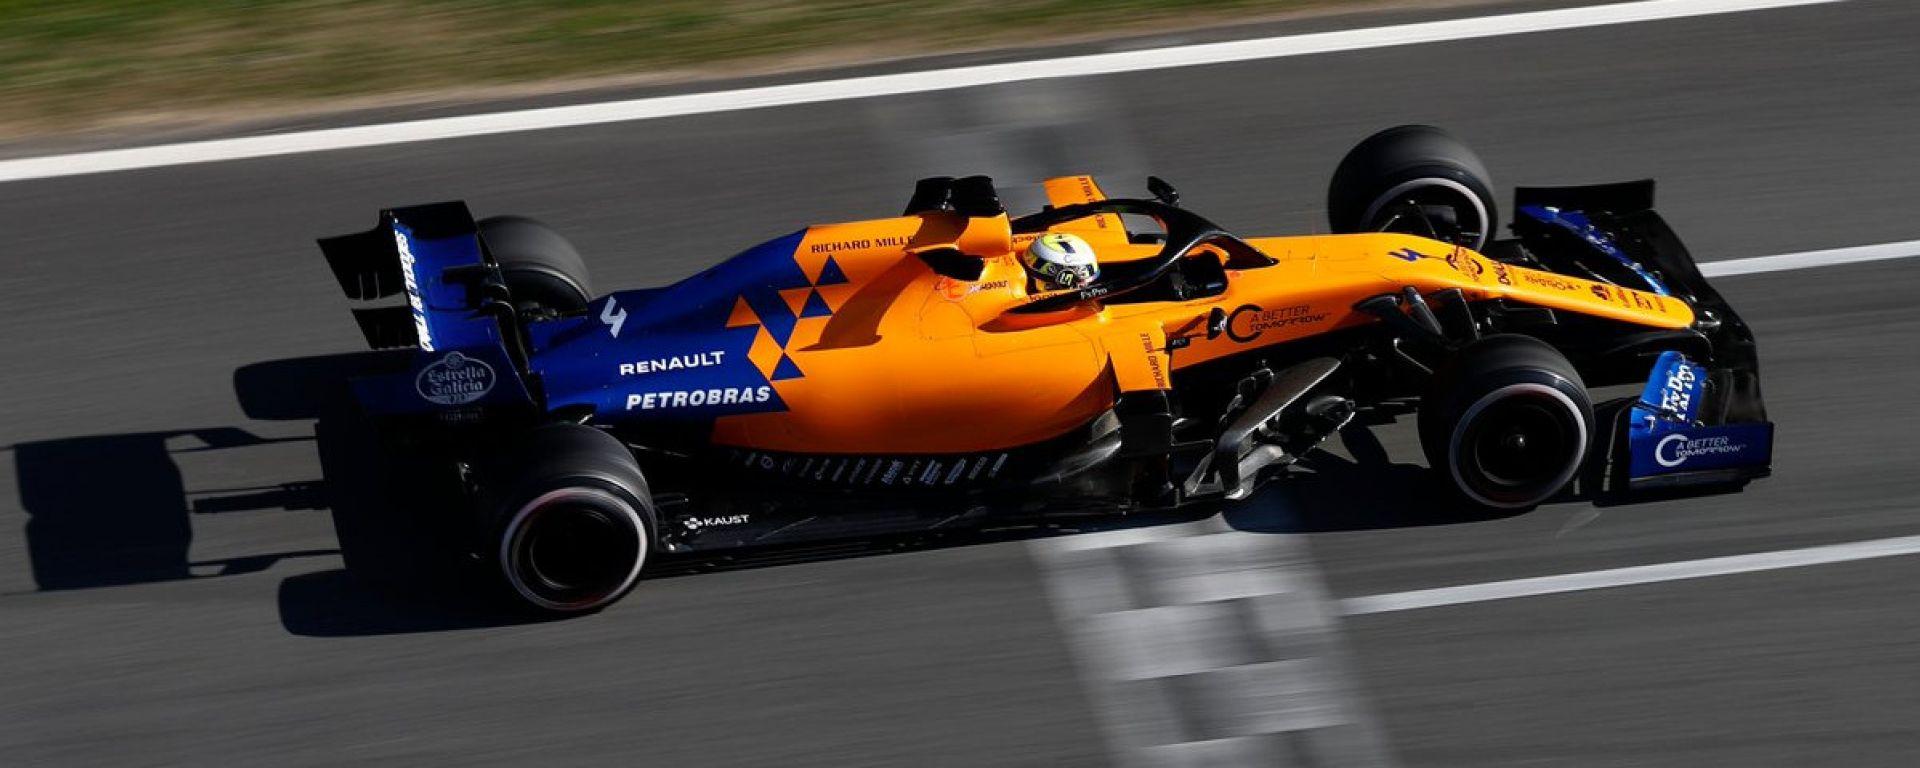 Test F1 Barcellona-2 - Day 1, Lando Norris (McLaren)